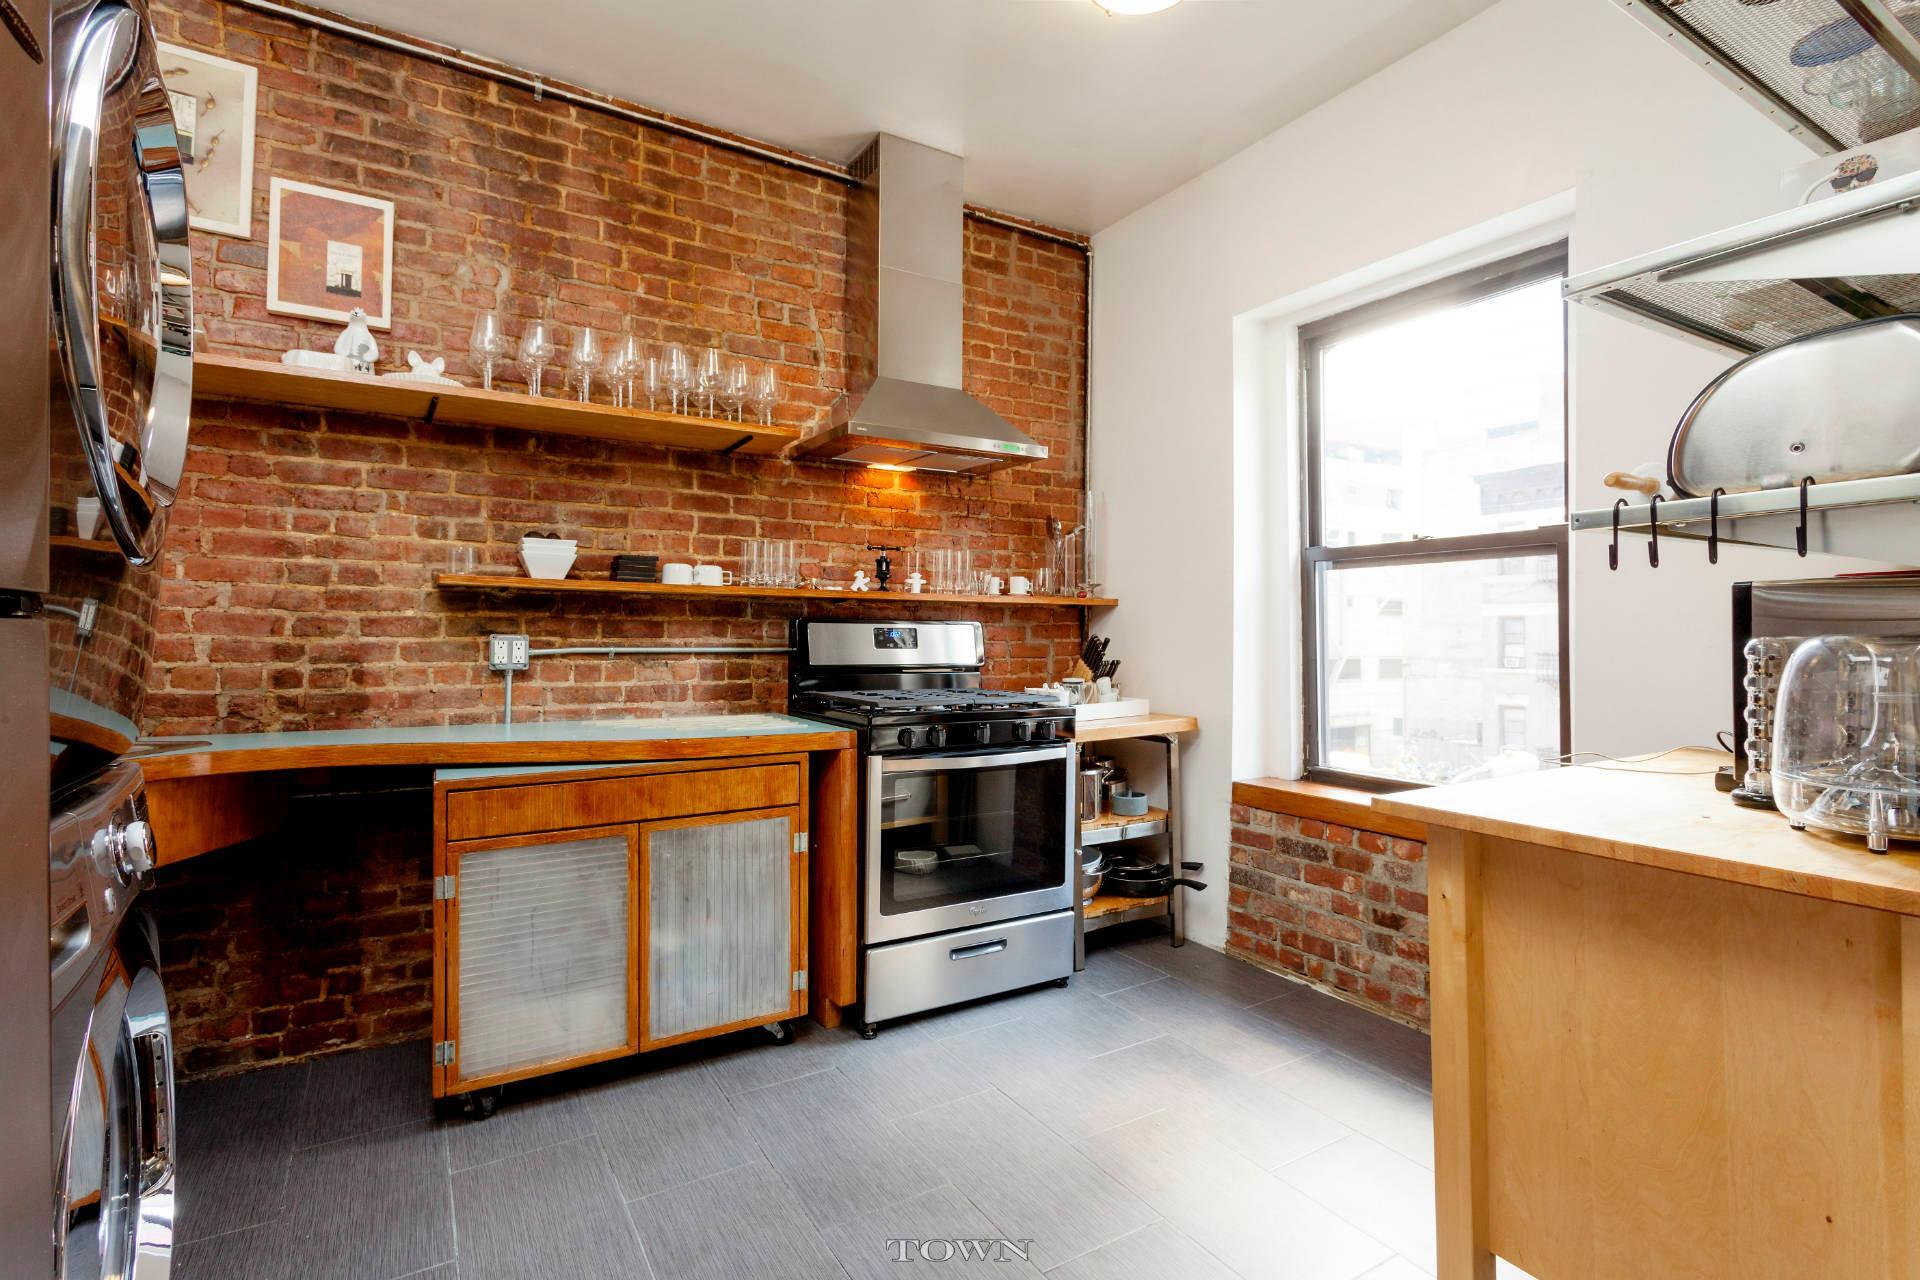 529 9th avenue, rental, kitchen